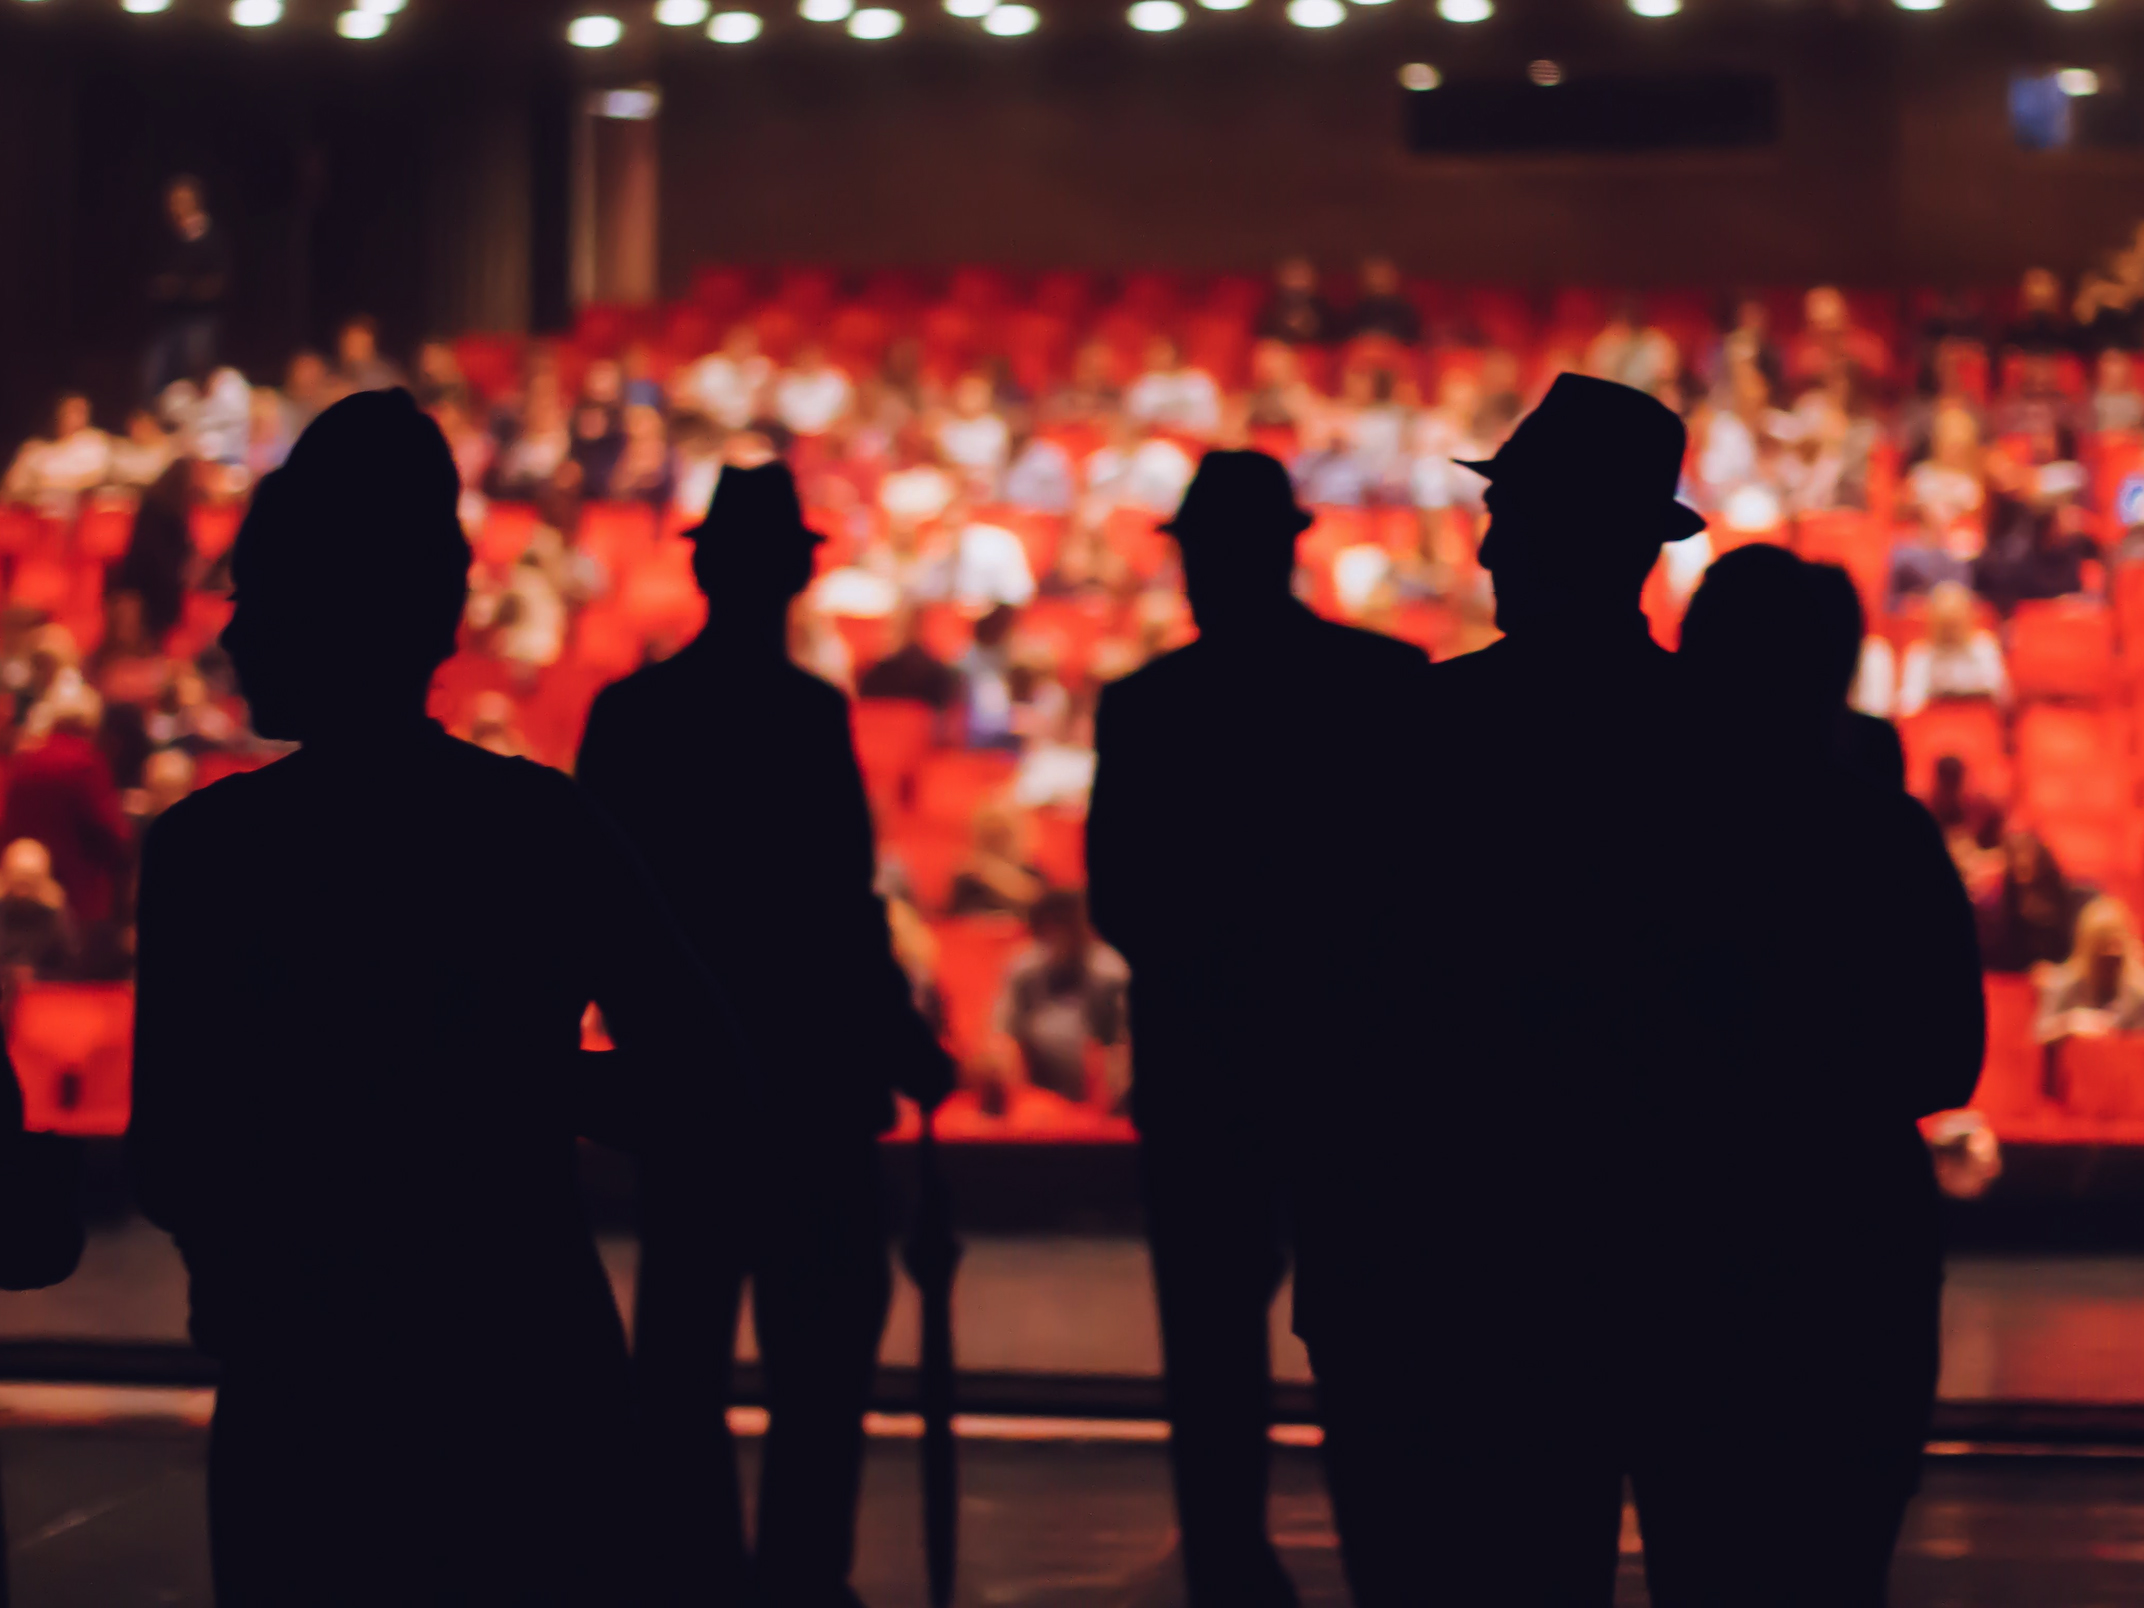 Театр - Голливудские актеры на Бродвее